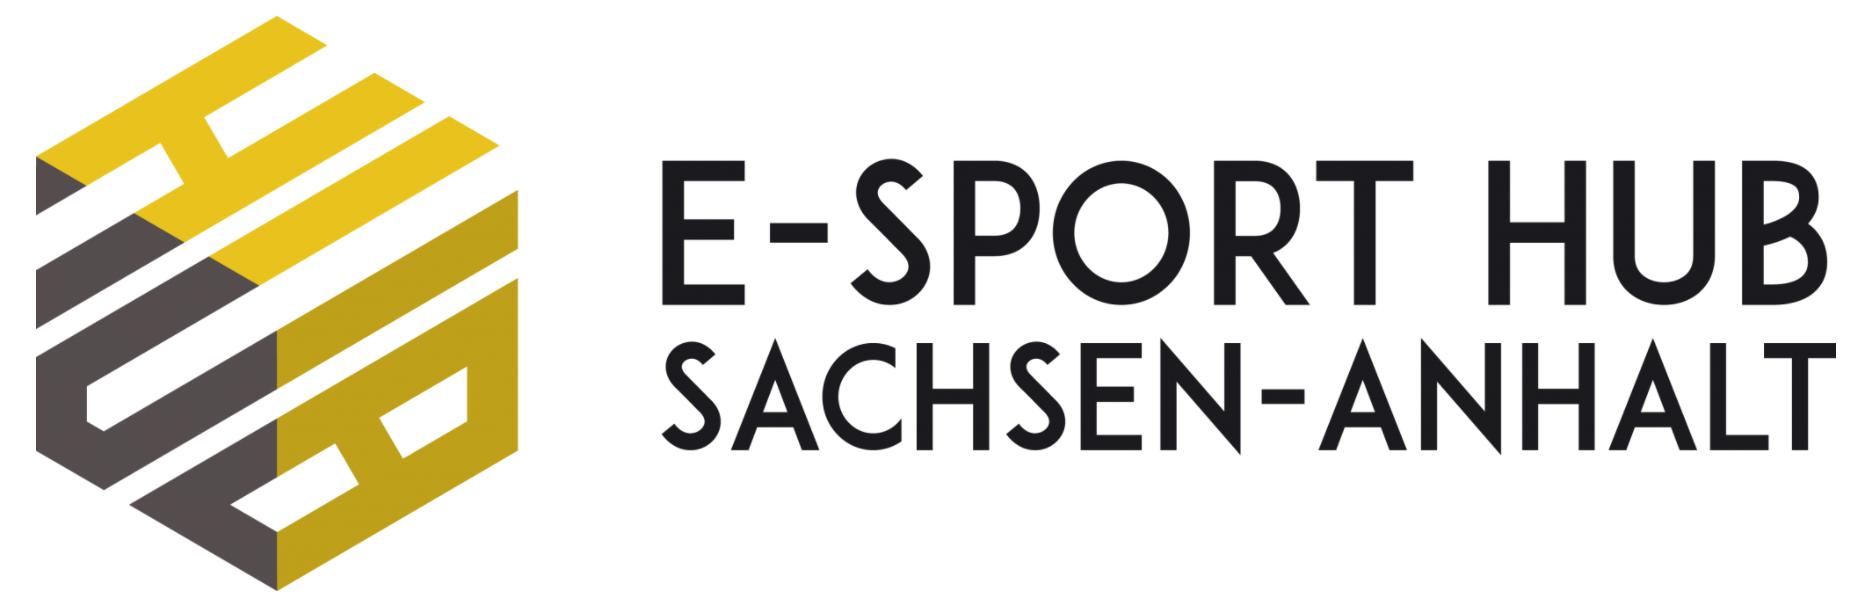 E-SPORTS HUB SACHSEN-ANHALT